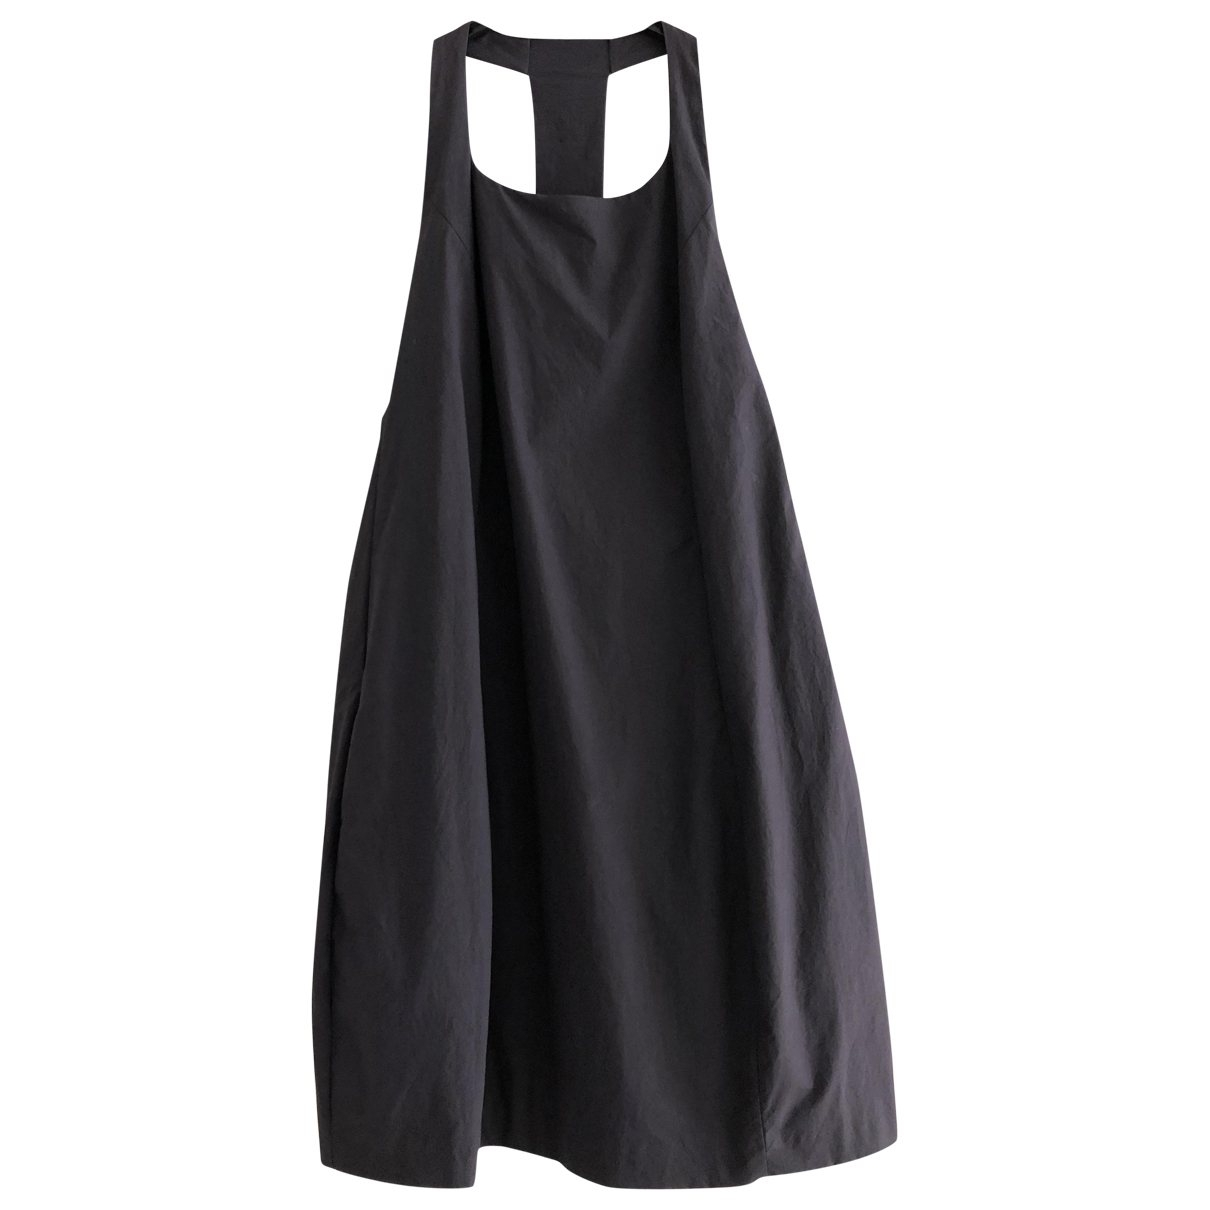 Dondup \N Cotton dress for Women 42 IT